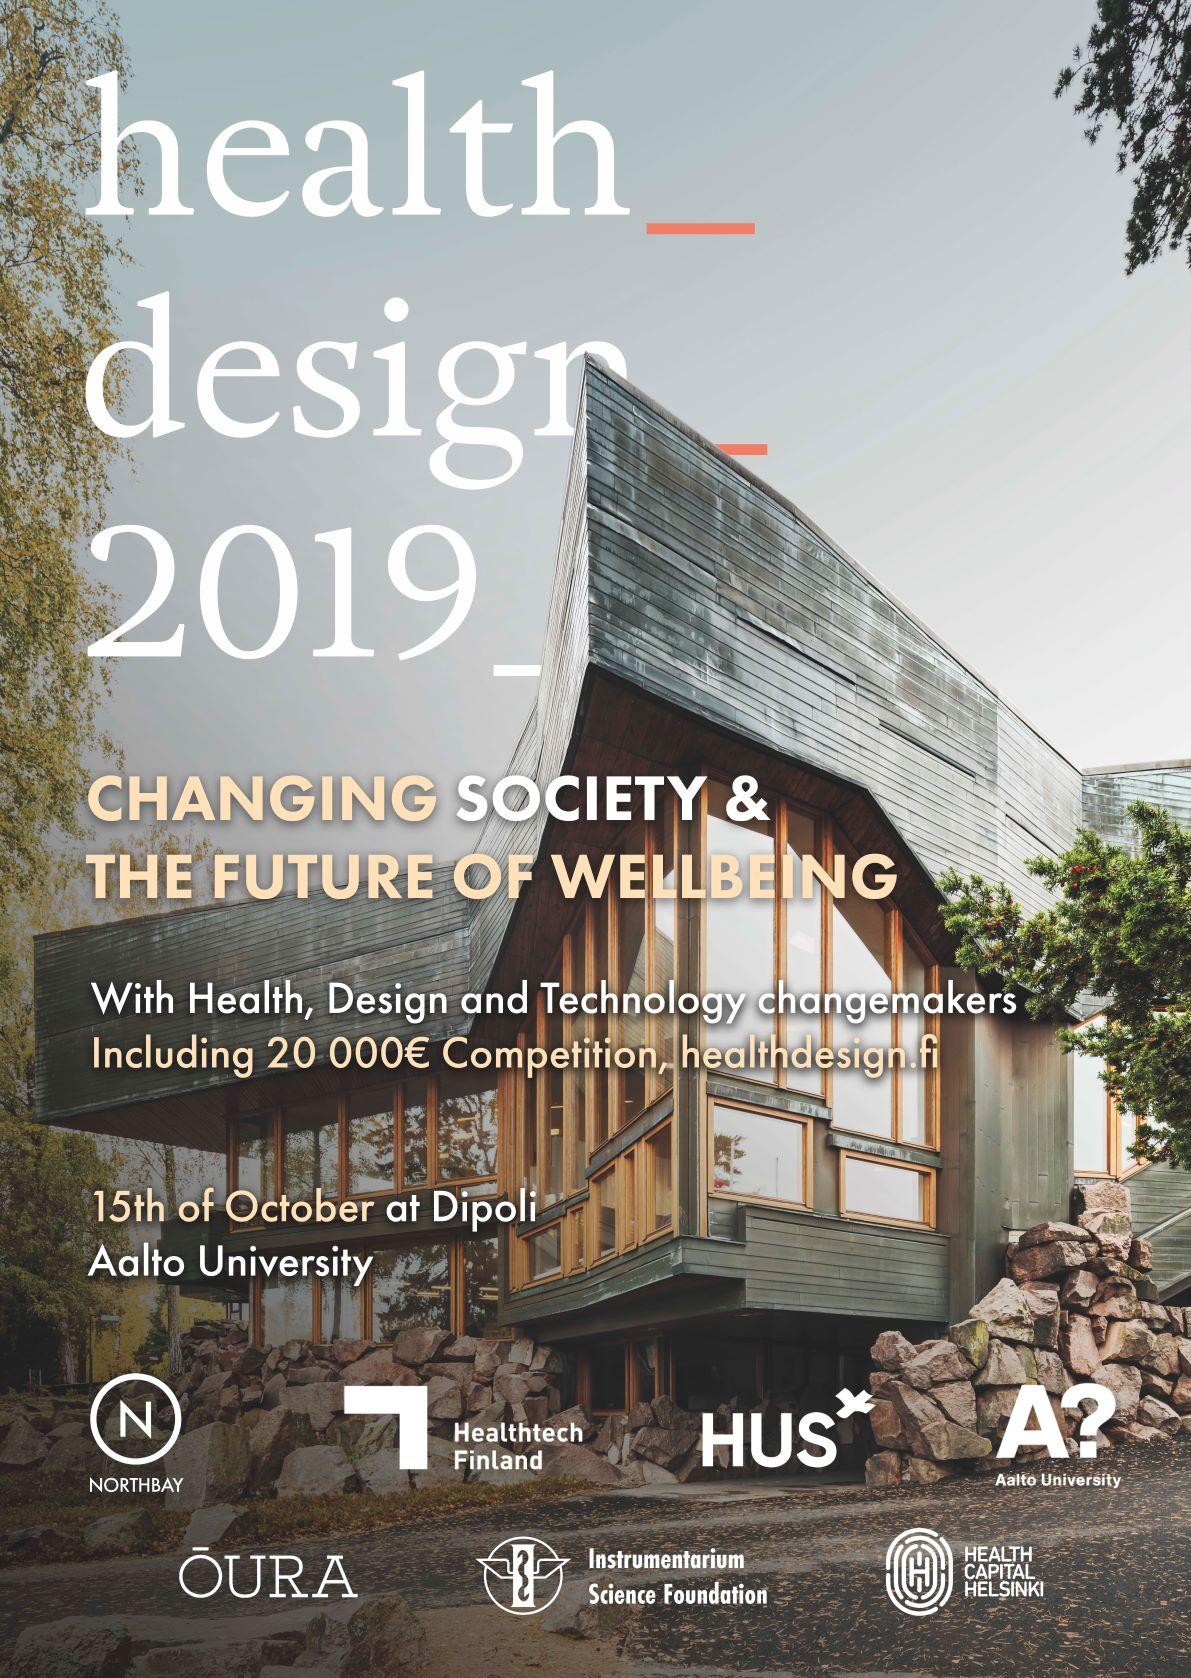 Health Design Poster design with Dipoli Architecture